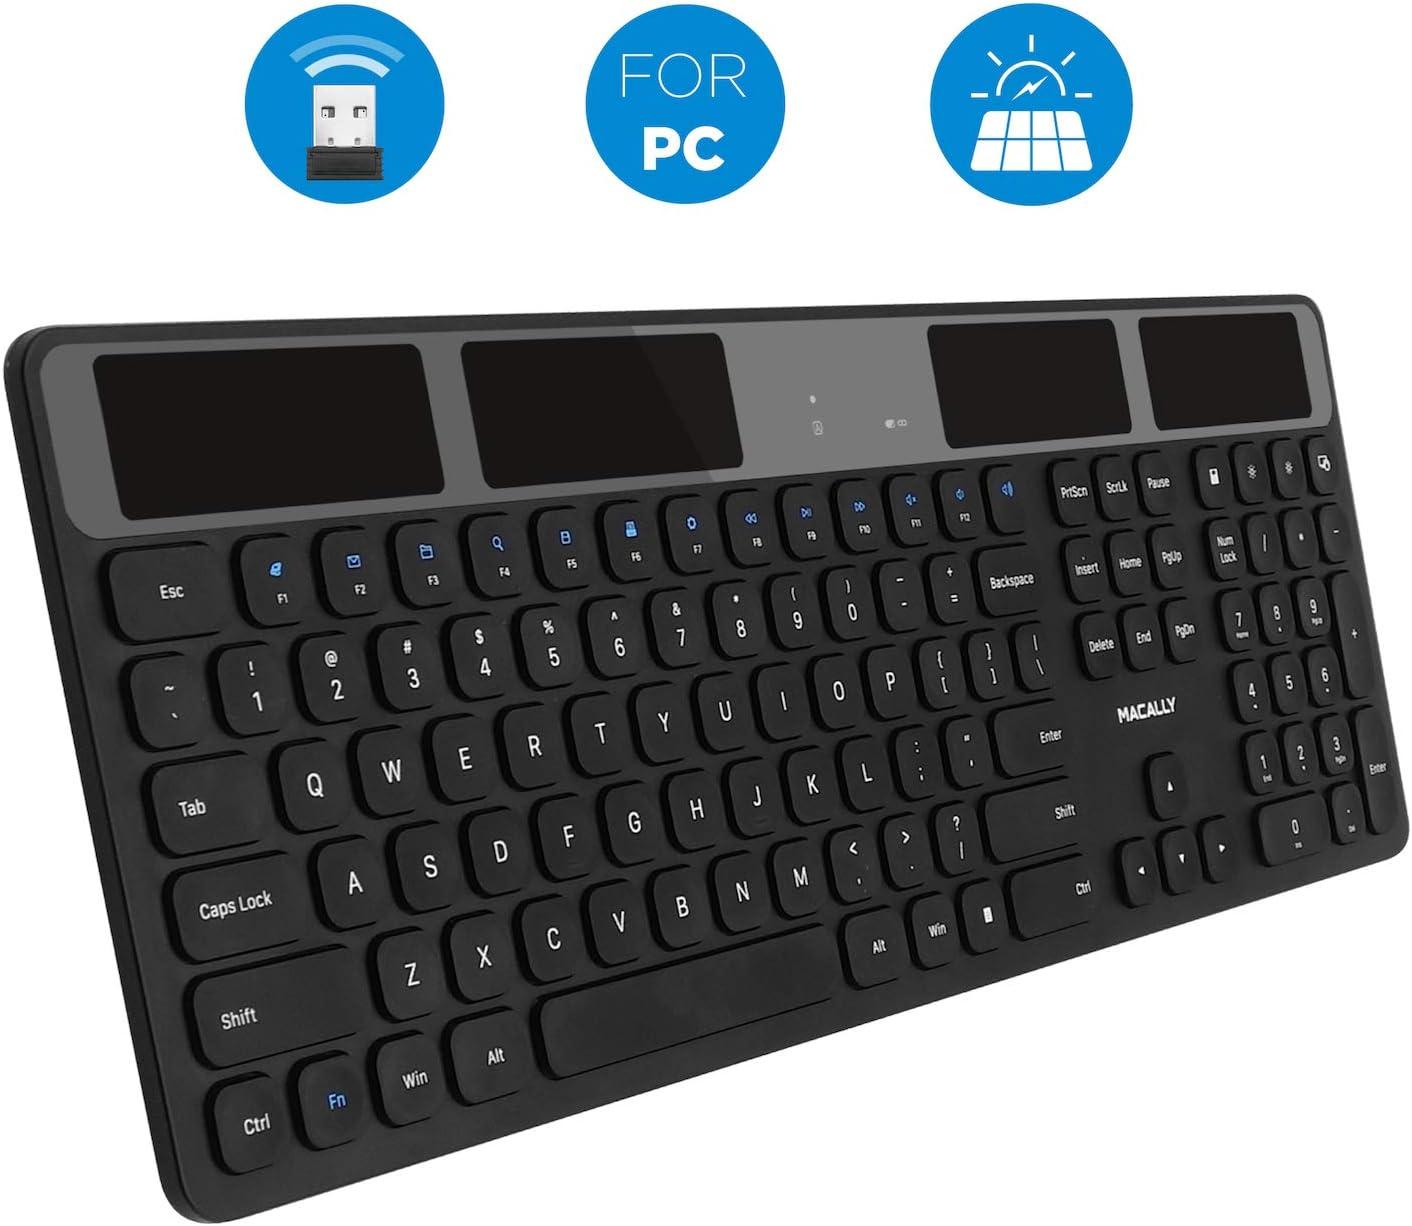 Macally Wireless Solar Keyboard for PC Computer Desktop, Laptops/Notebooks - Windows XP/Vista/7/8/9/10-2.4 GHz RF USB Dongle - Rechargeable Via Light - Caps Lock/Battery LED Indicators - Black